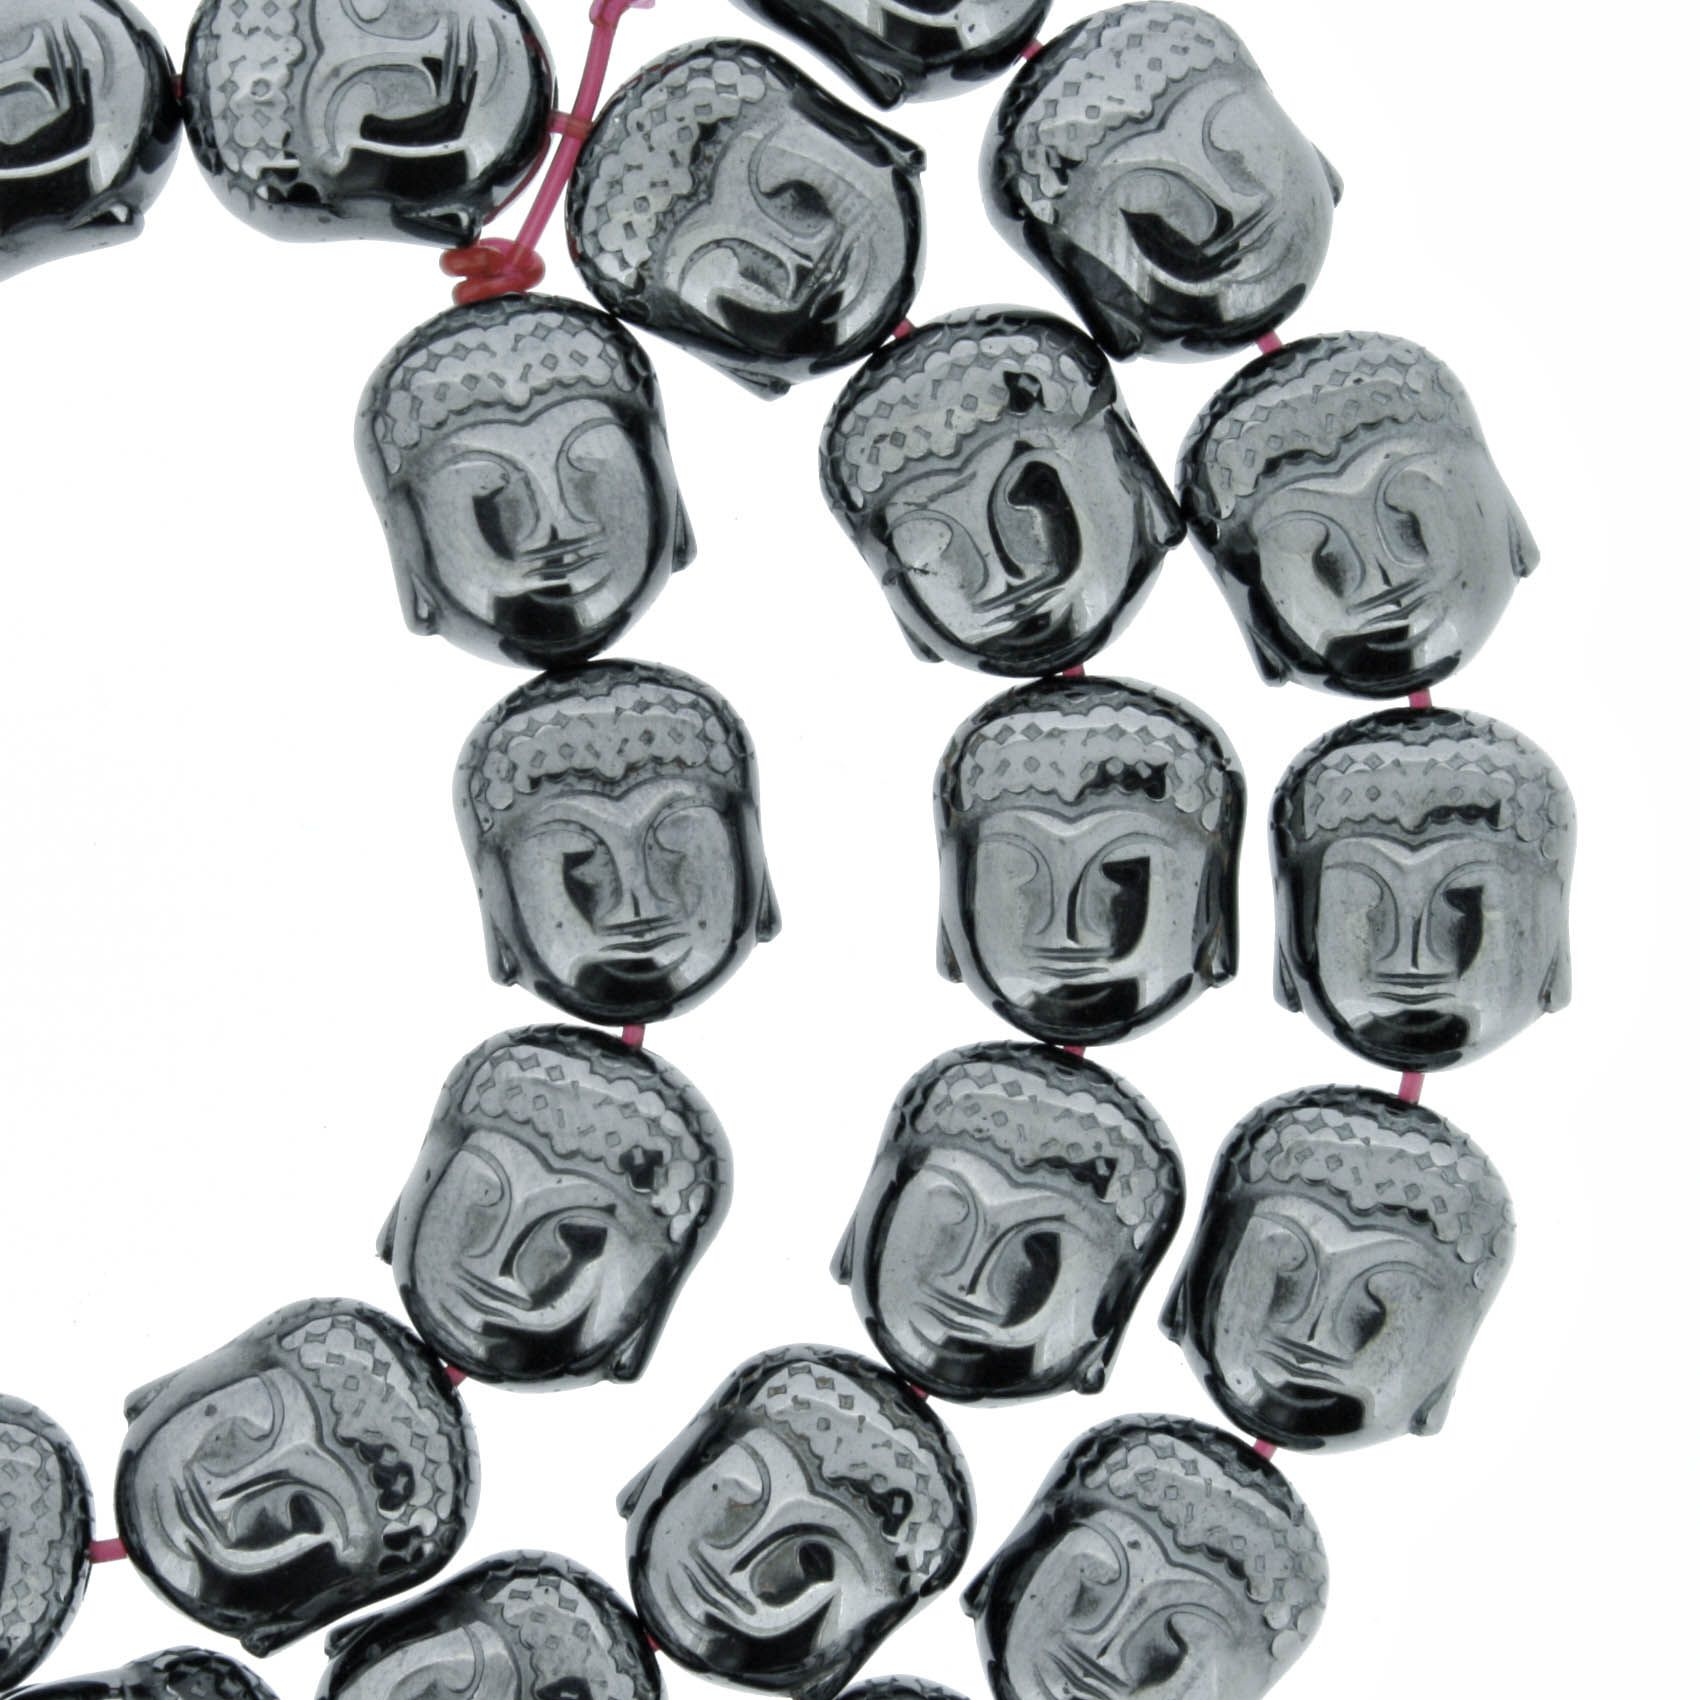 Fio de Pedra - Hematita Buda - 8mm  - Stéphanie Bijoux® - Peças para Bijuterias e Artesanato